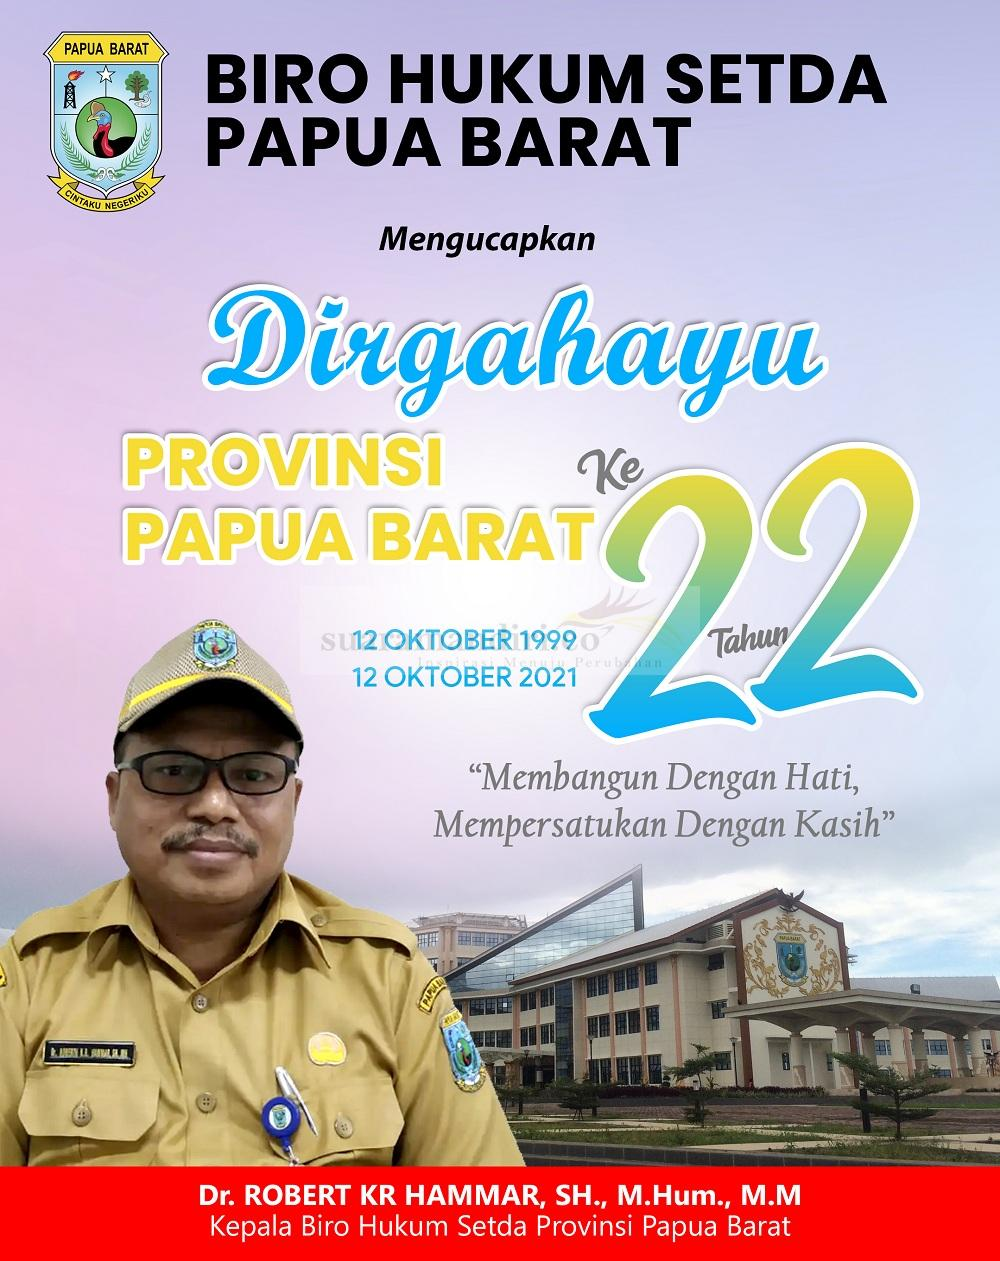 HUT Papua Barat 2021